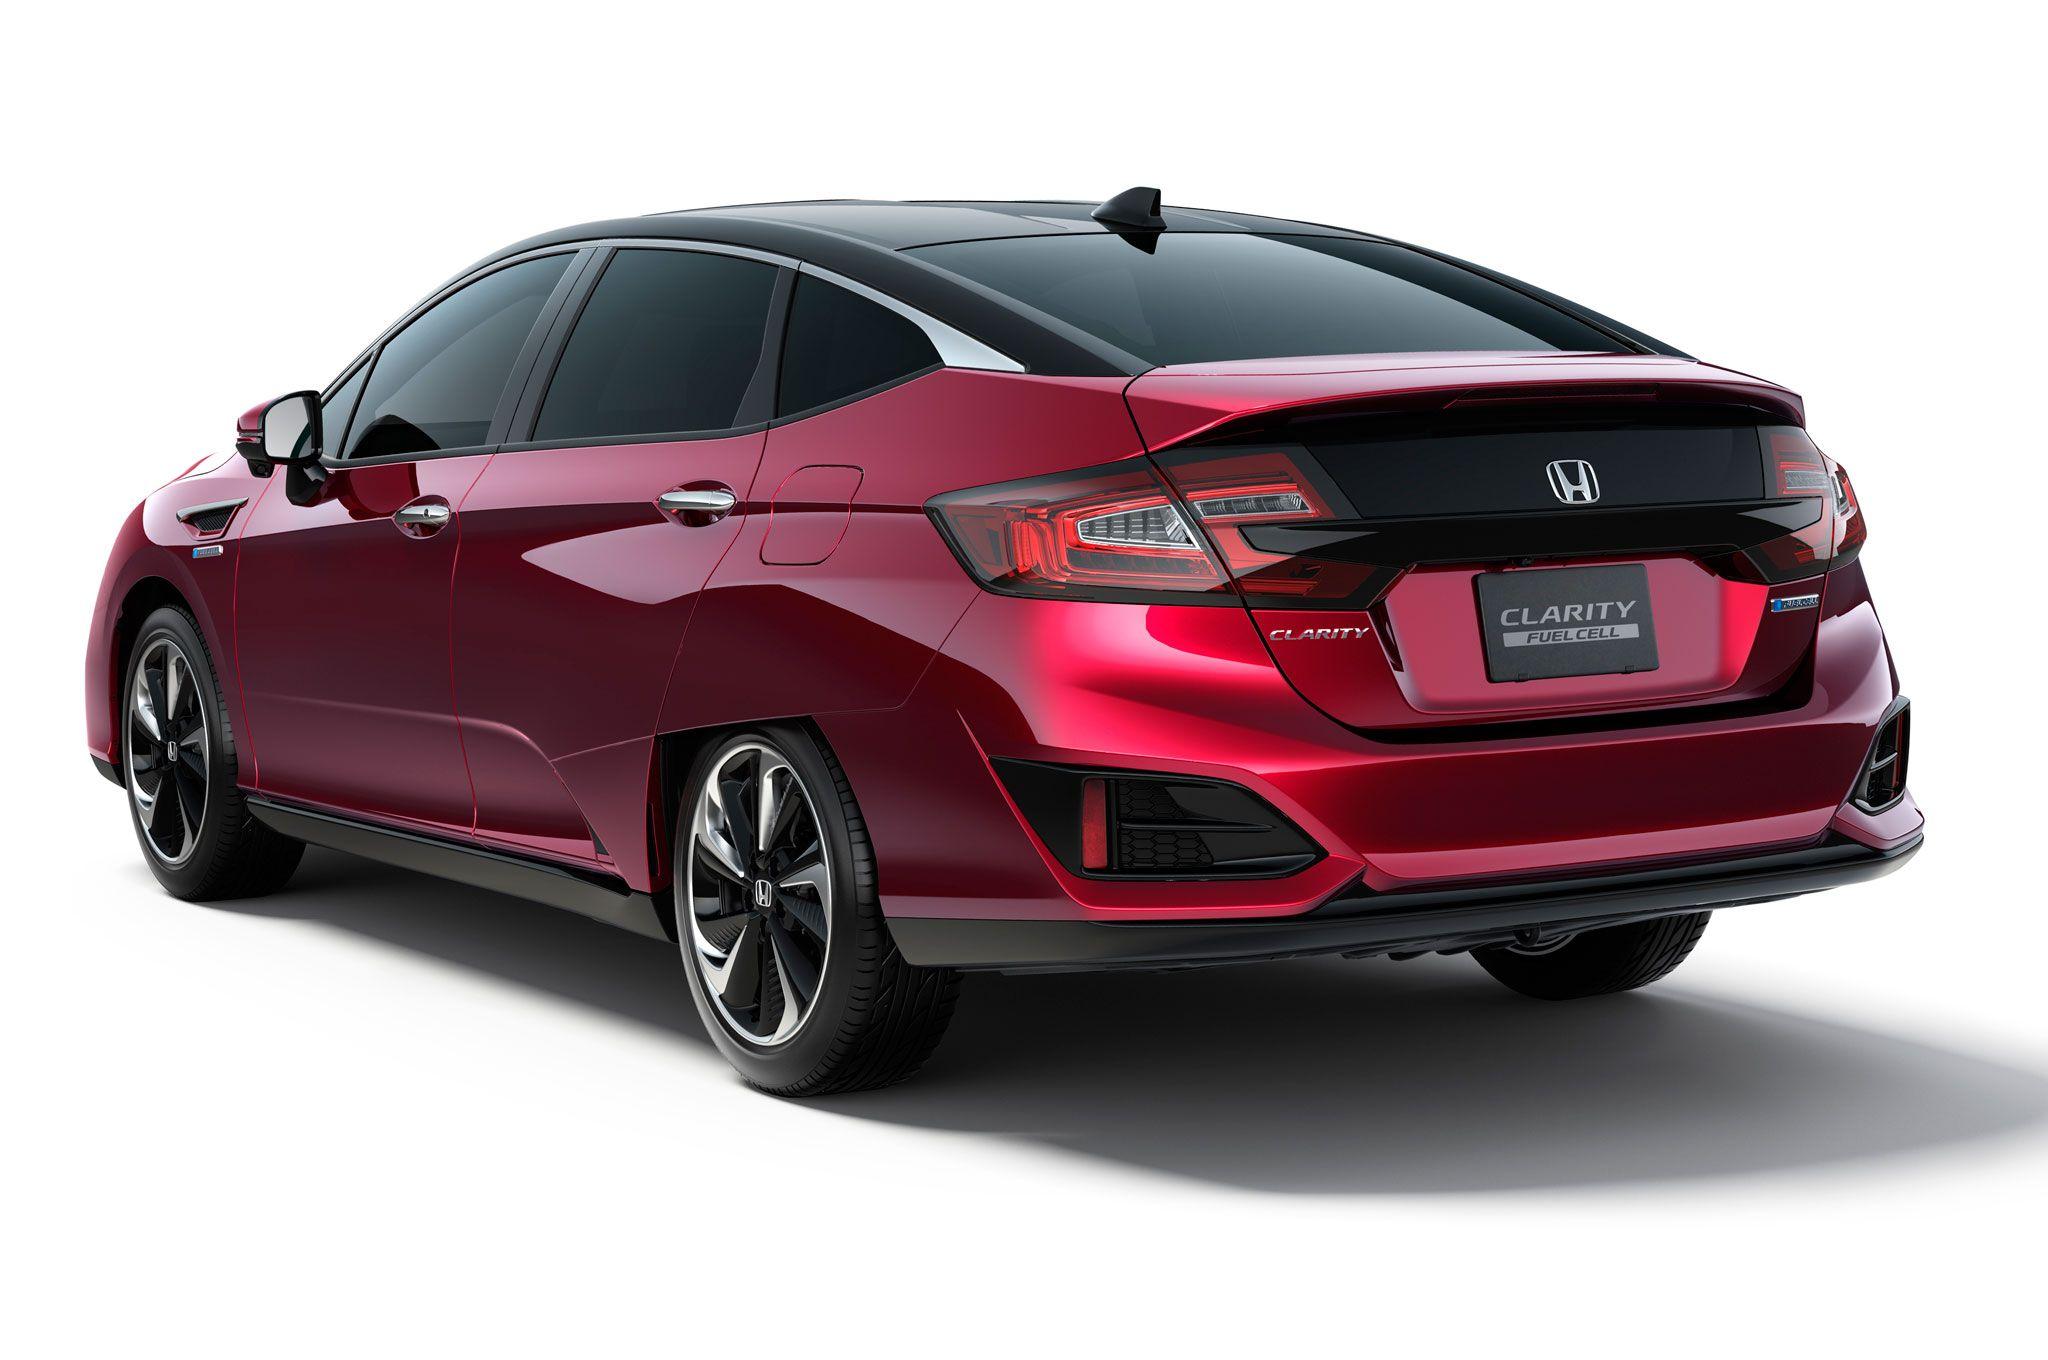 2017 Honda Clarity Specs